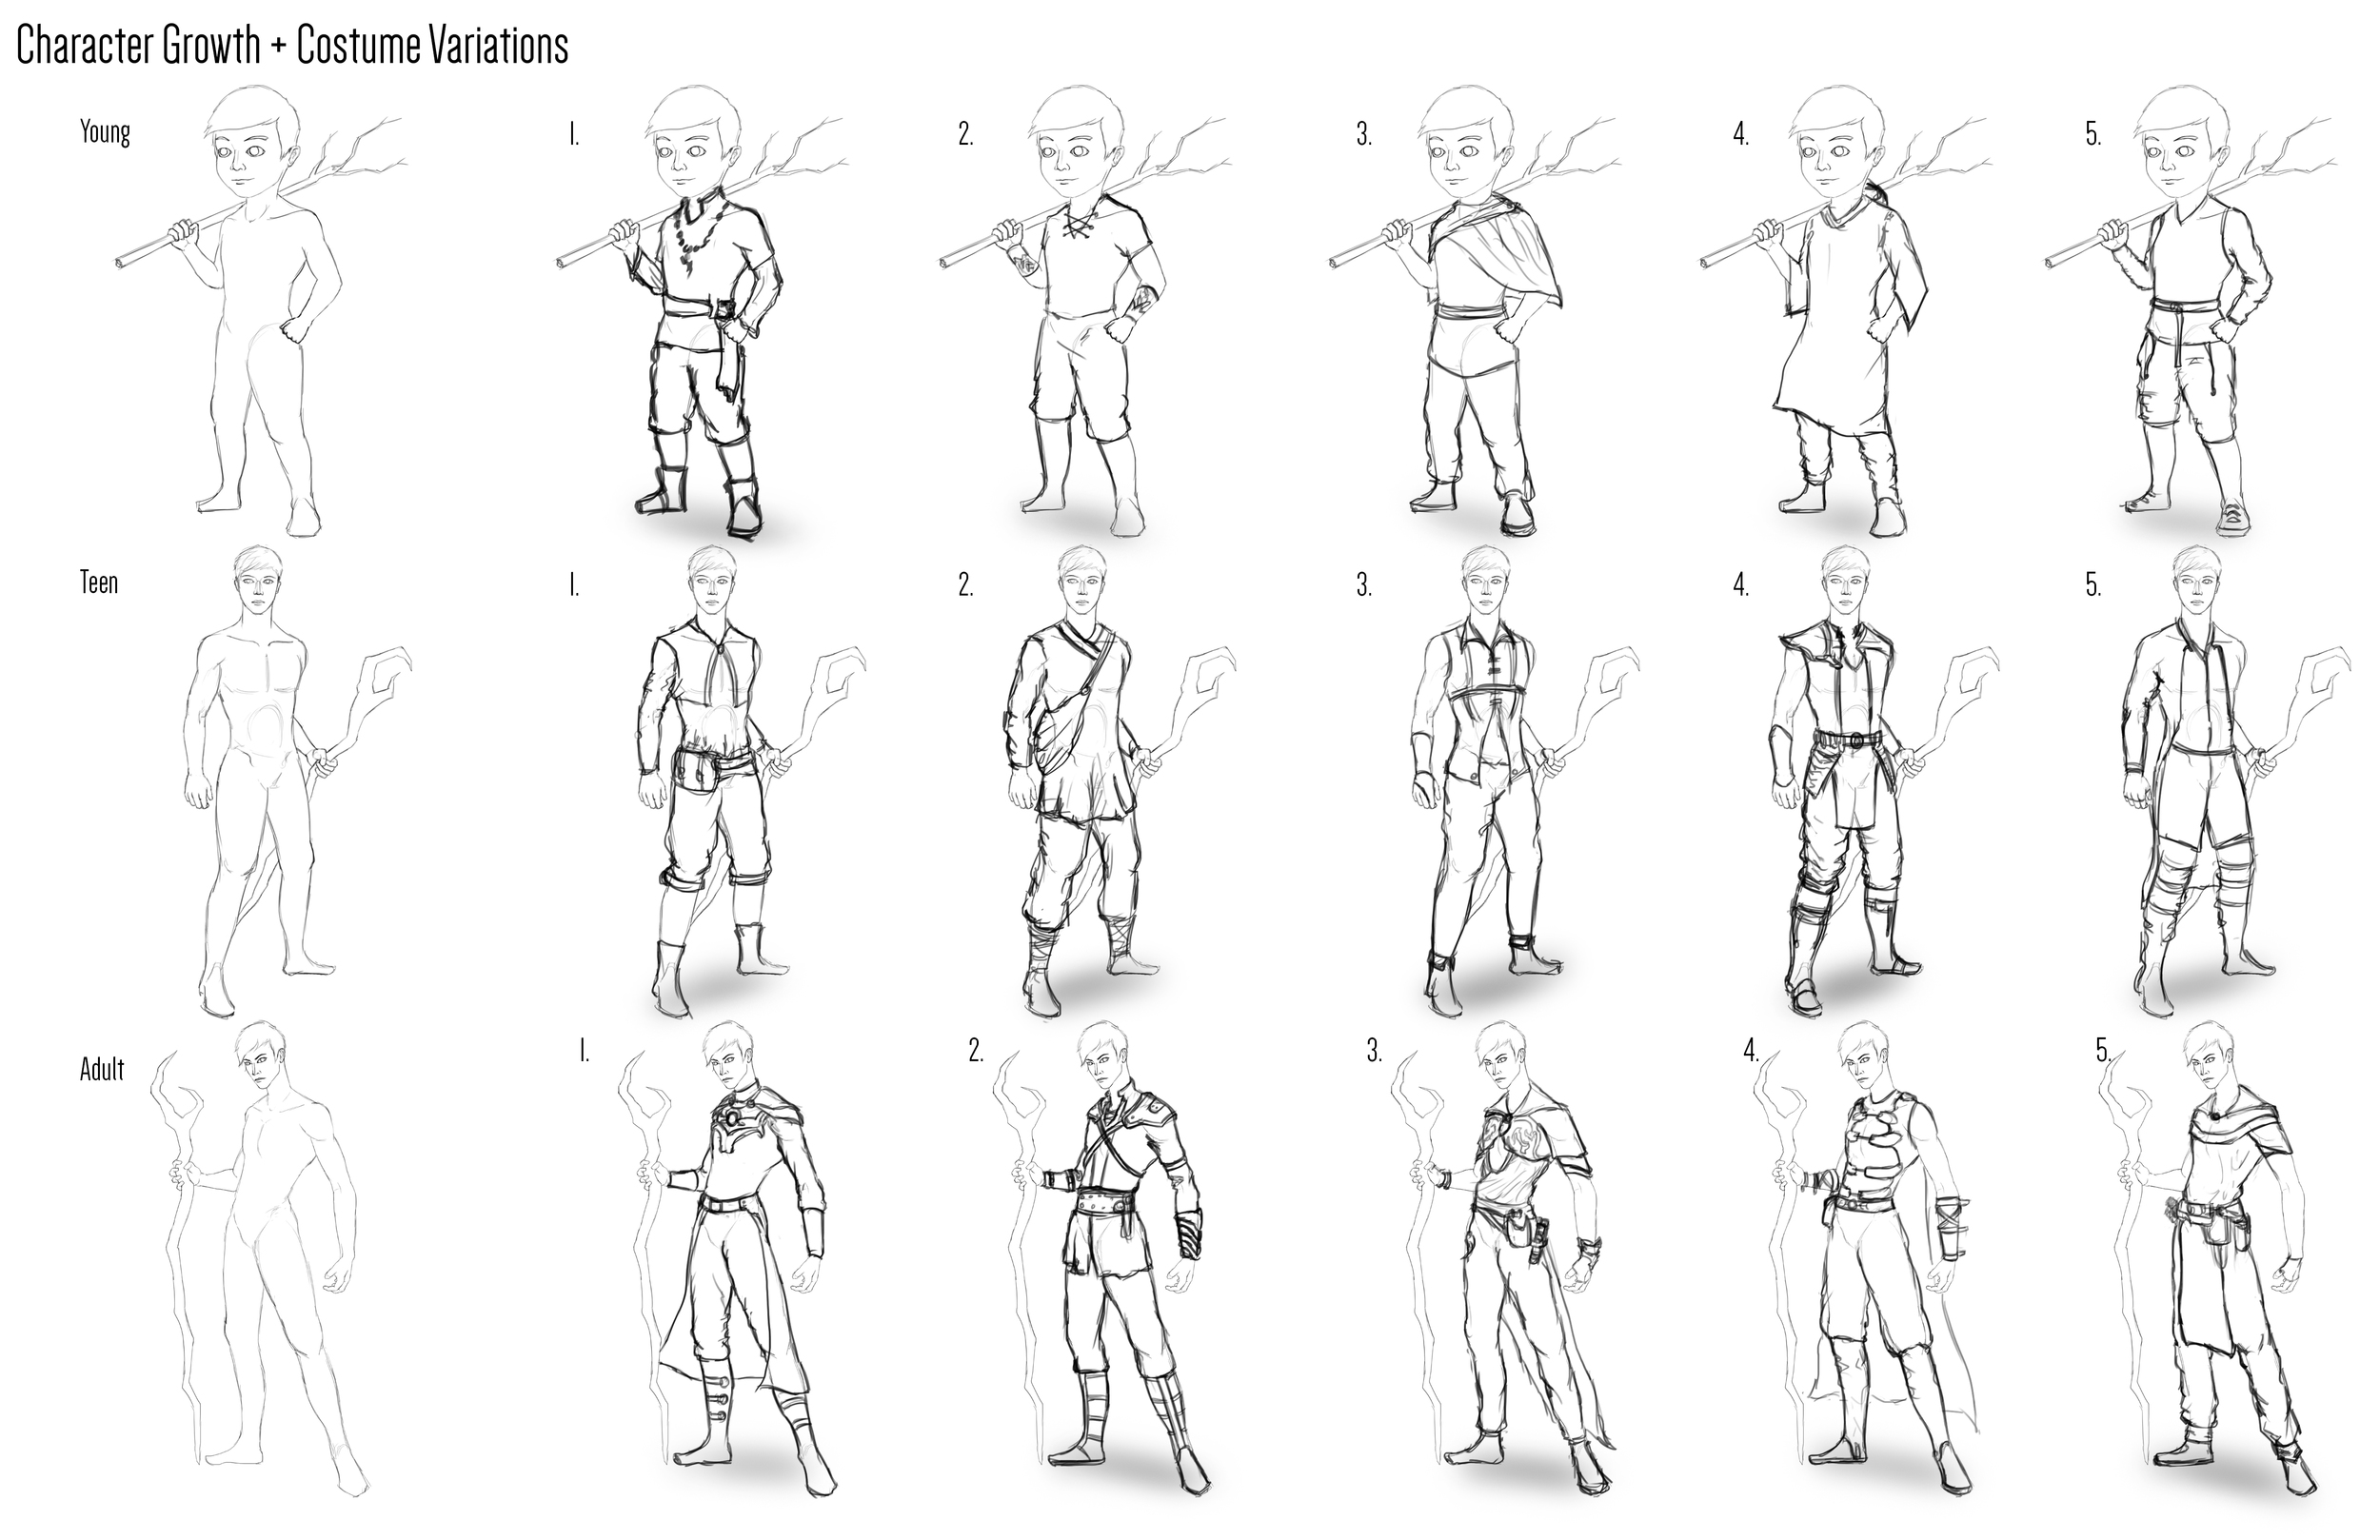 CharacterCostume01.jpg